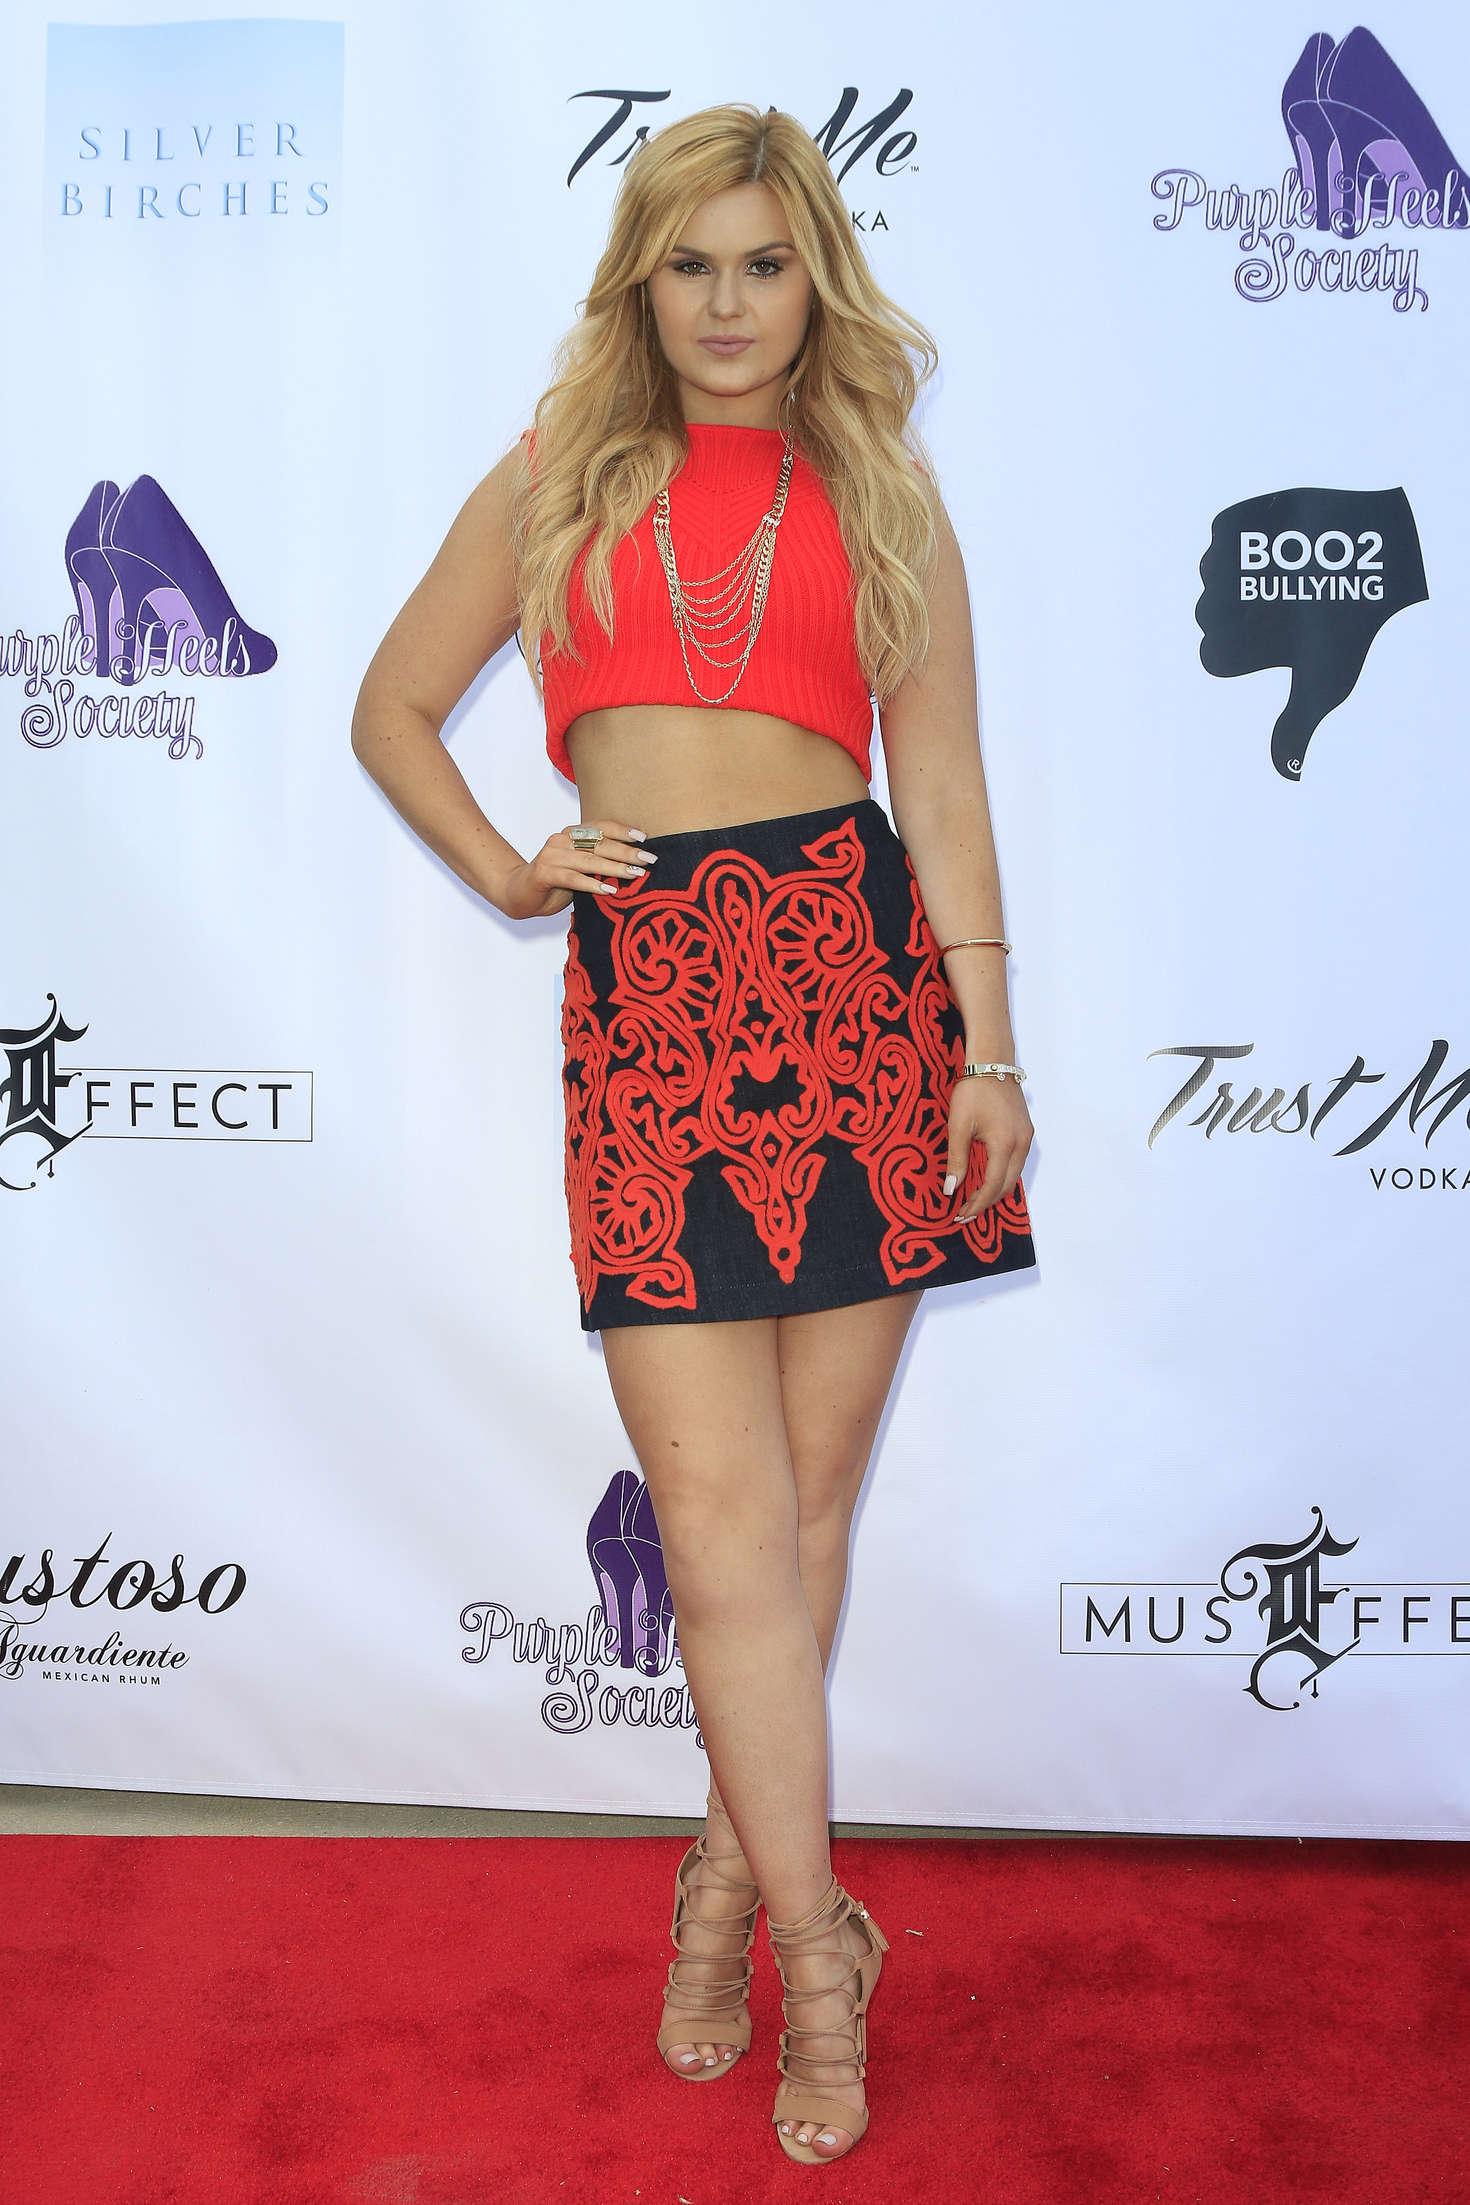 Ashlee Keating Boo2bullying Spring Soiree in Los Angeles